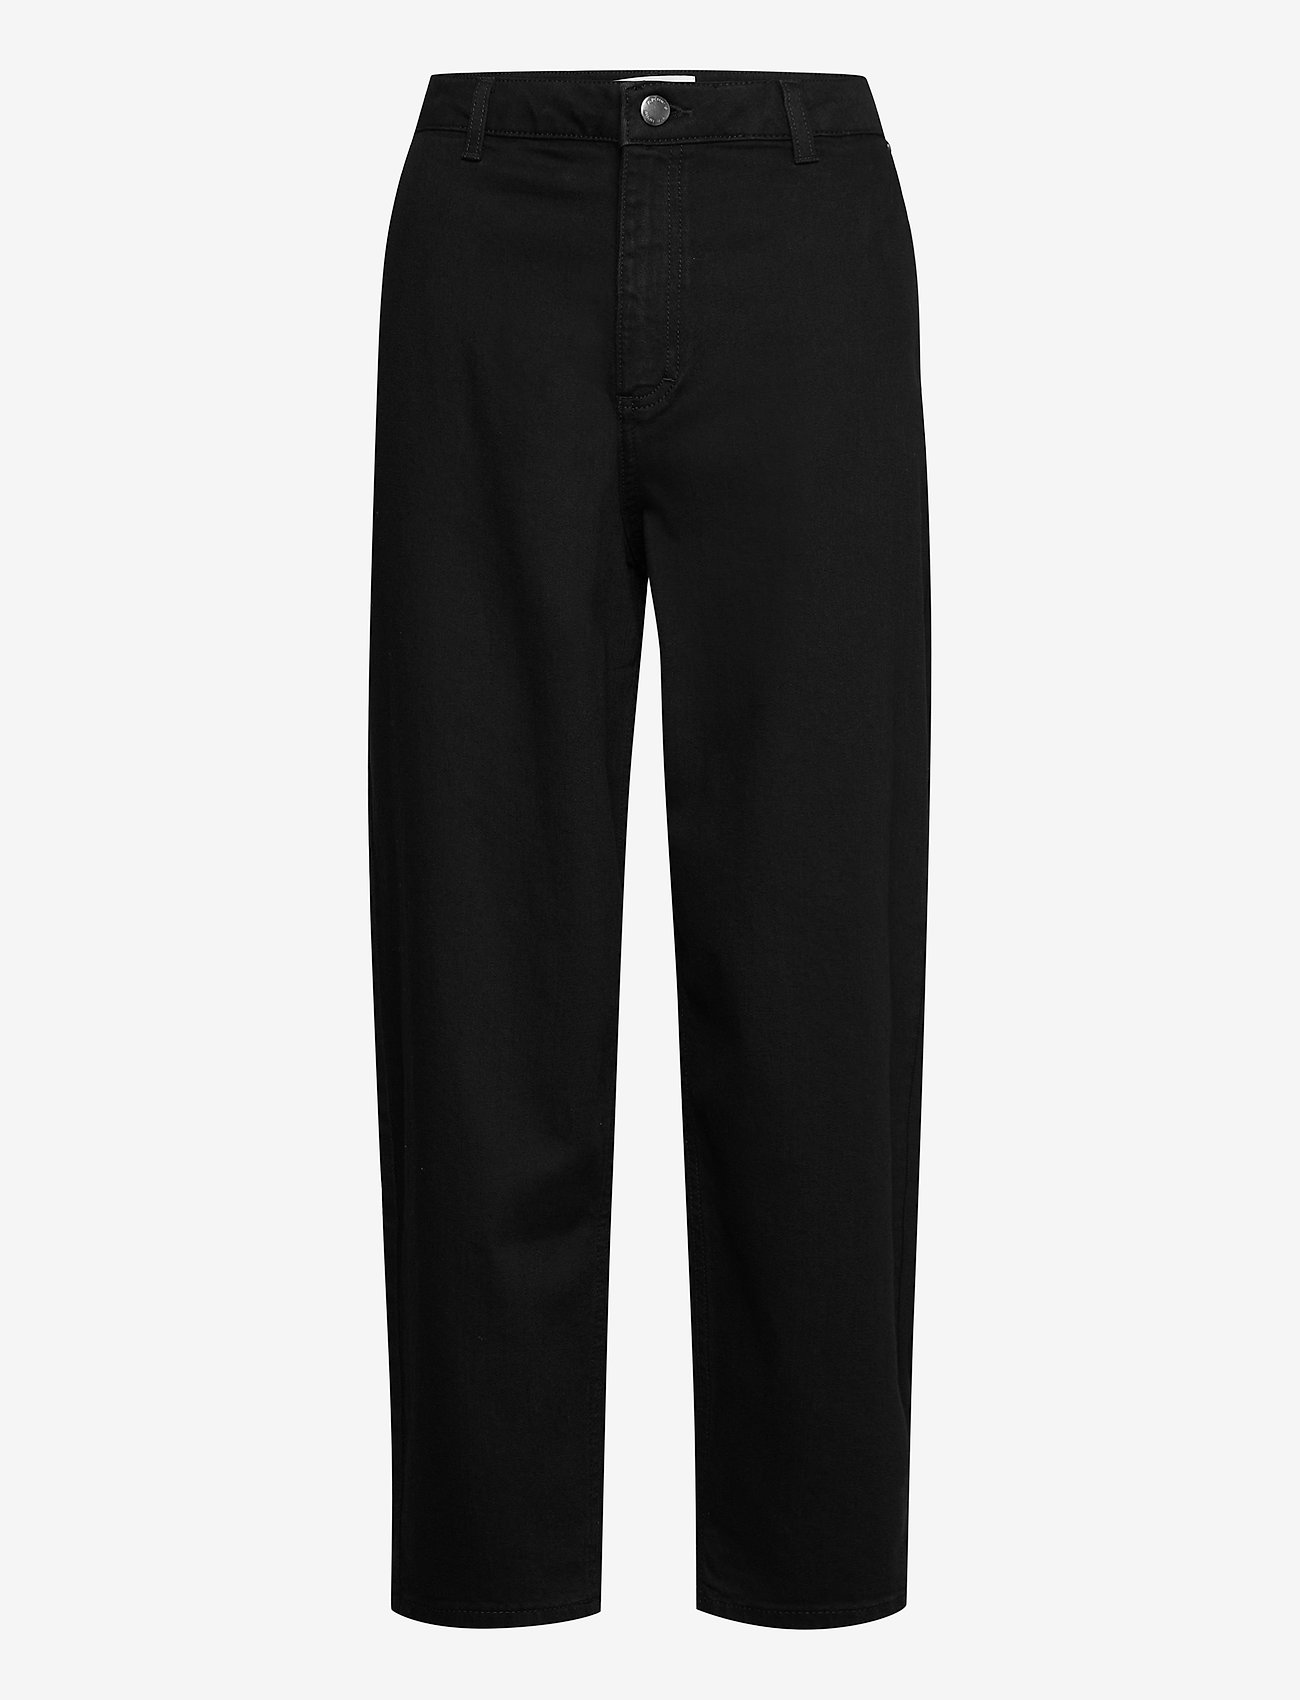 FIVEUNITS - Alba 241 - raka jeans - black auto - 0